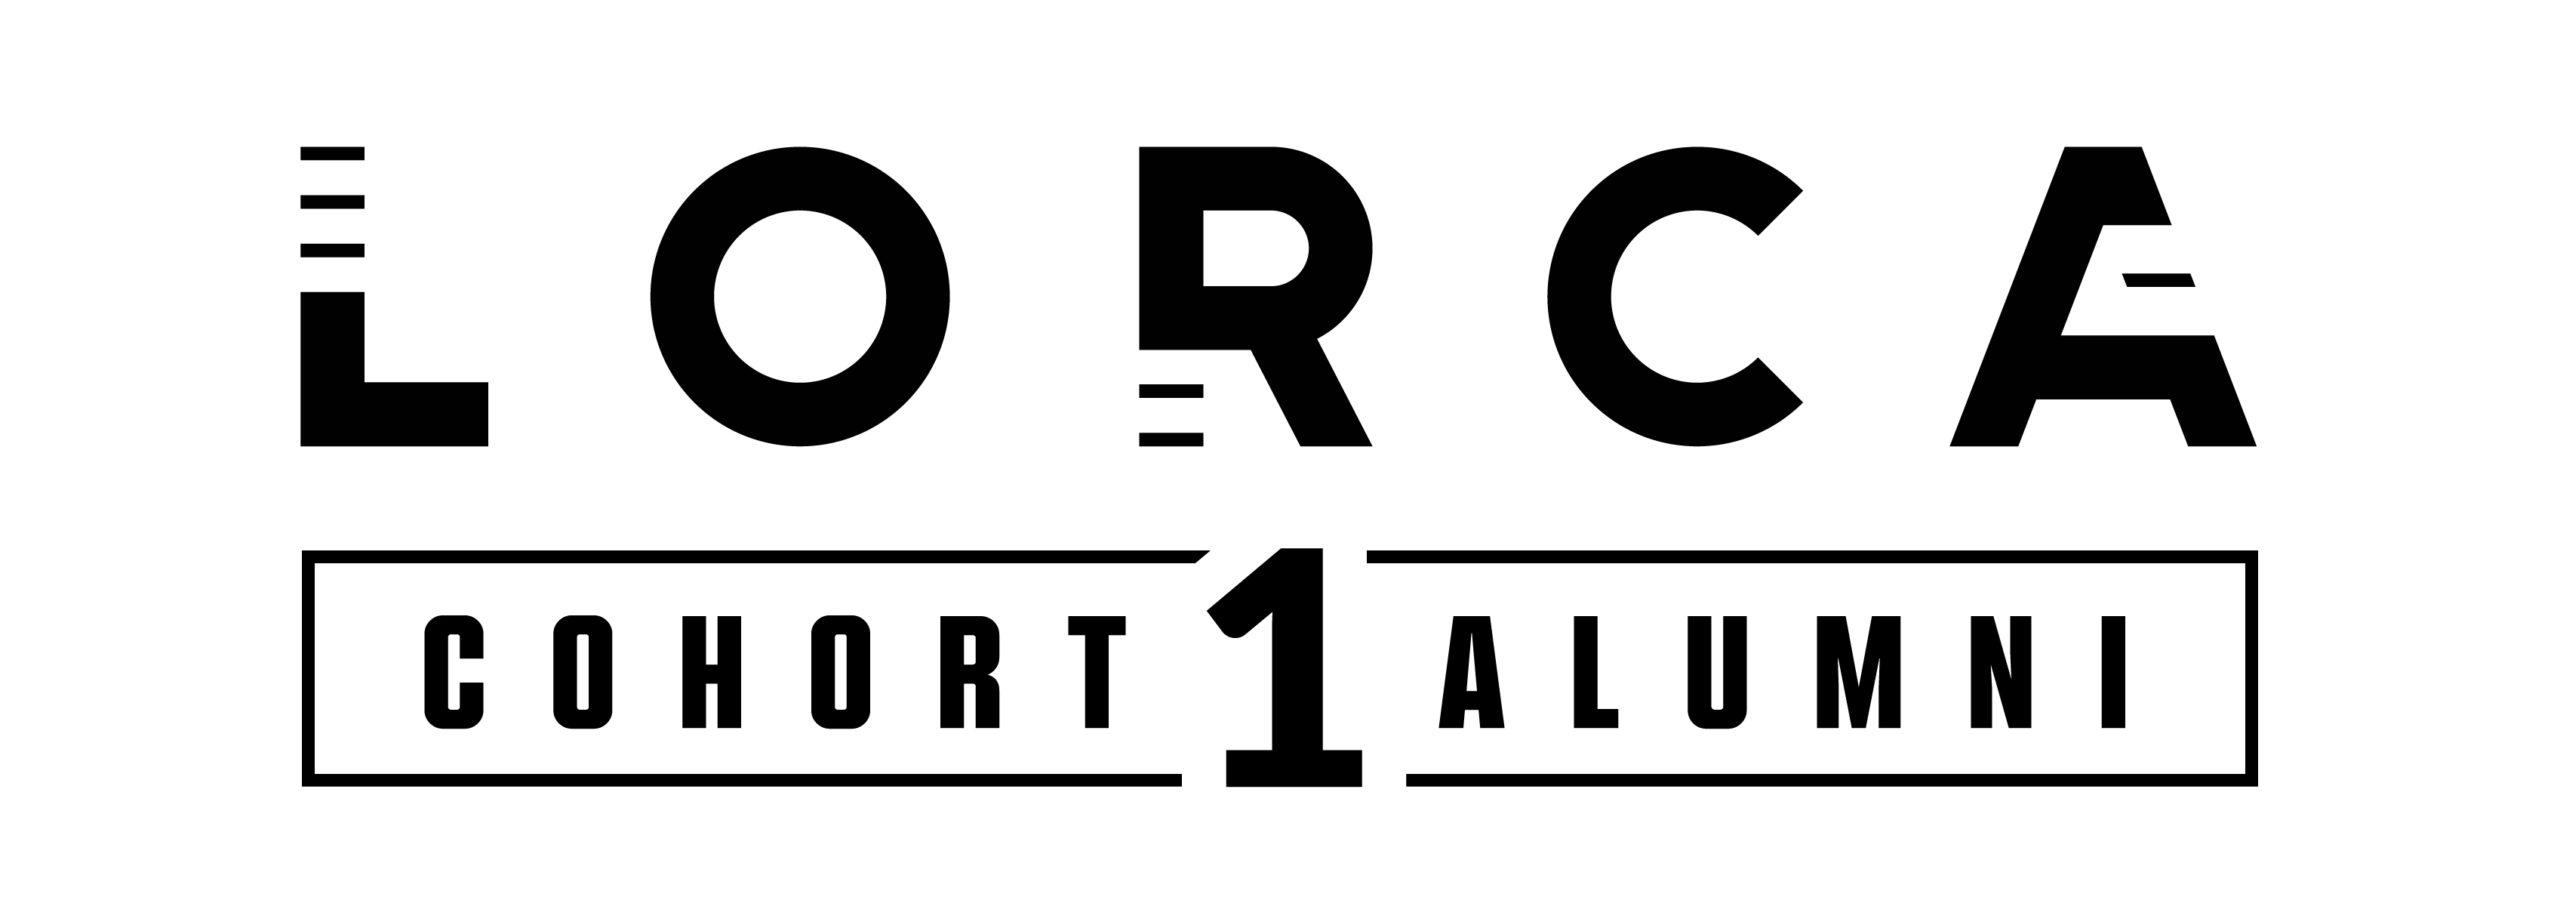 Lorca Cohort 1 alumni